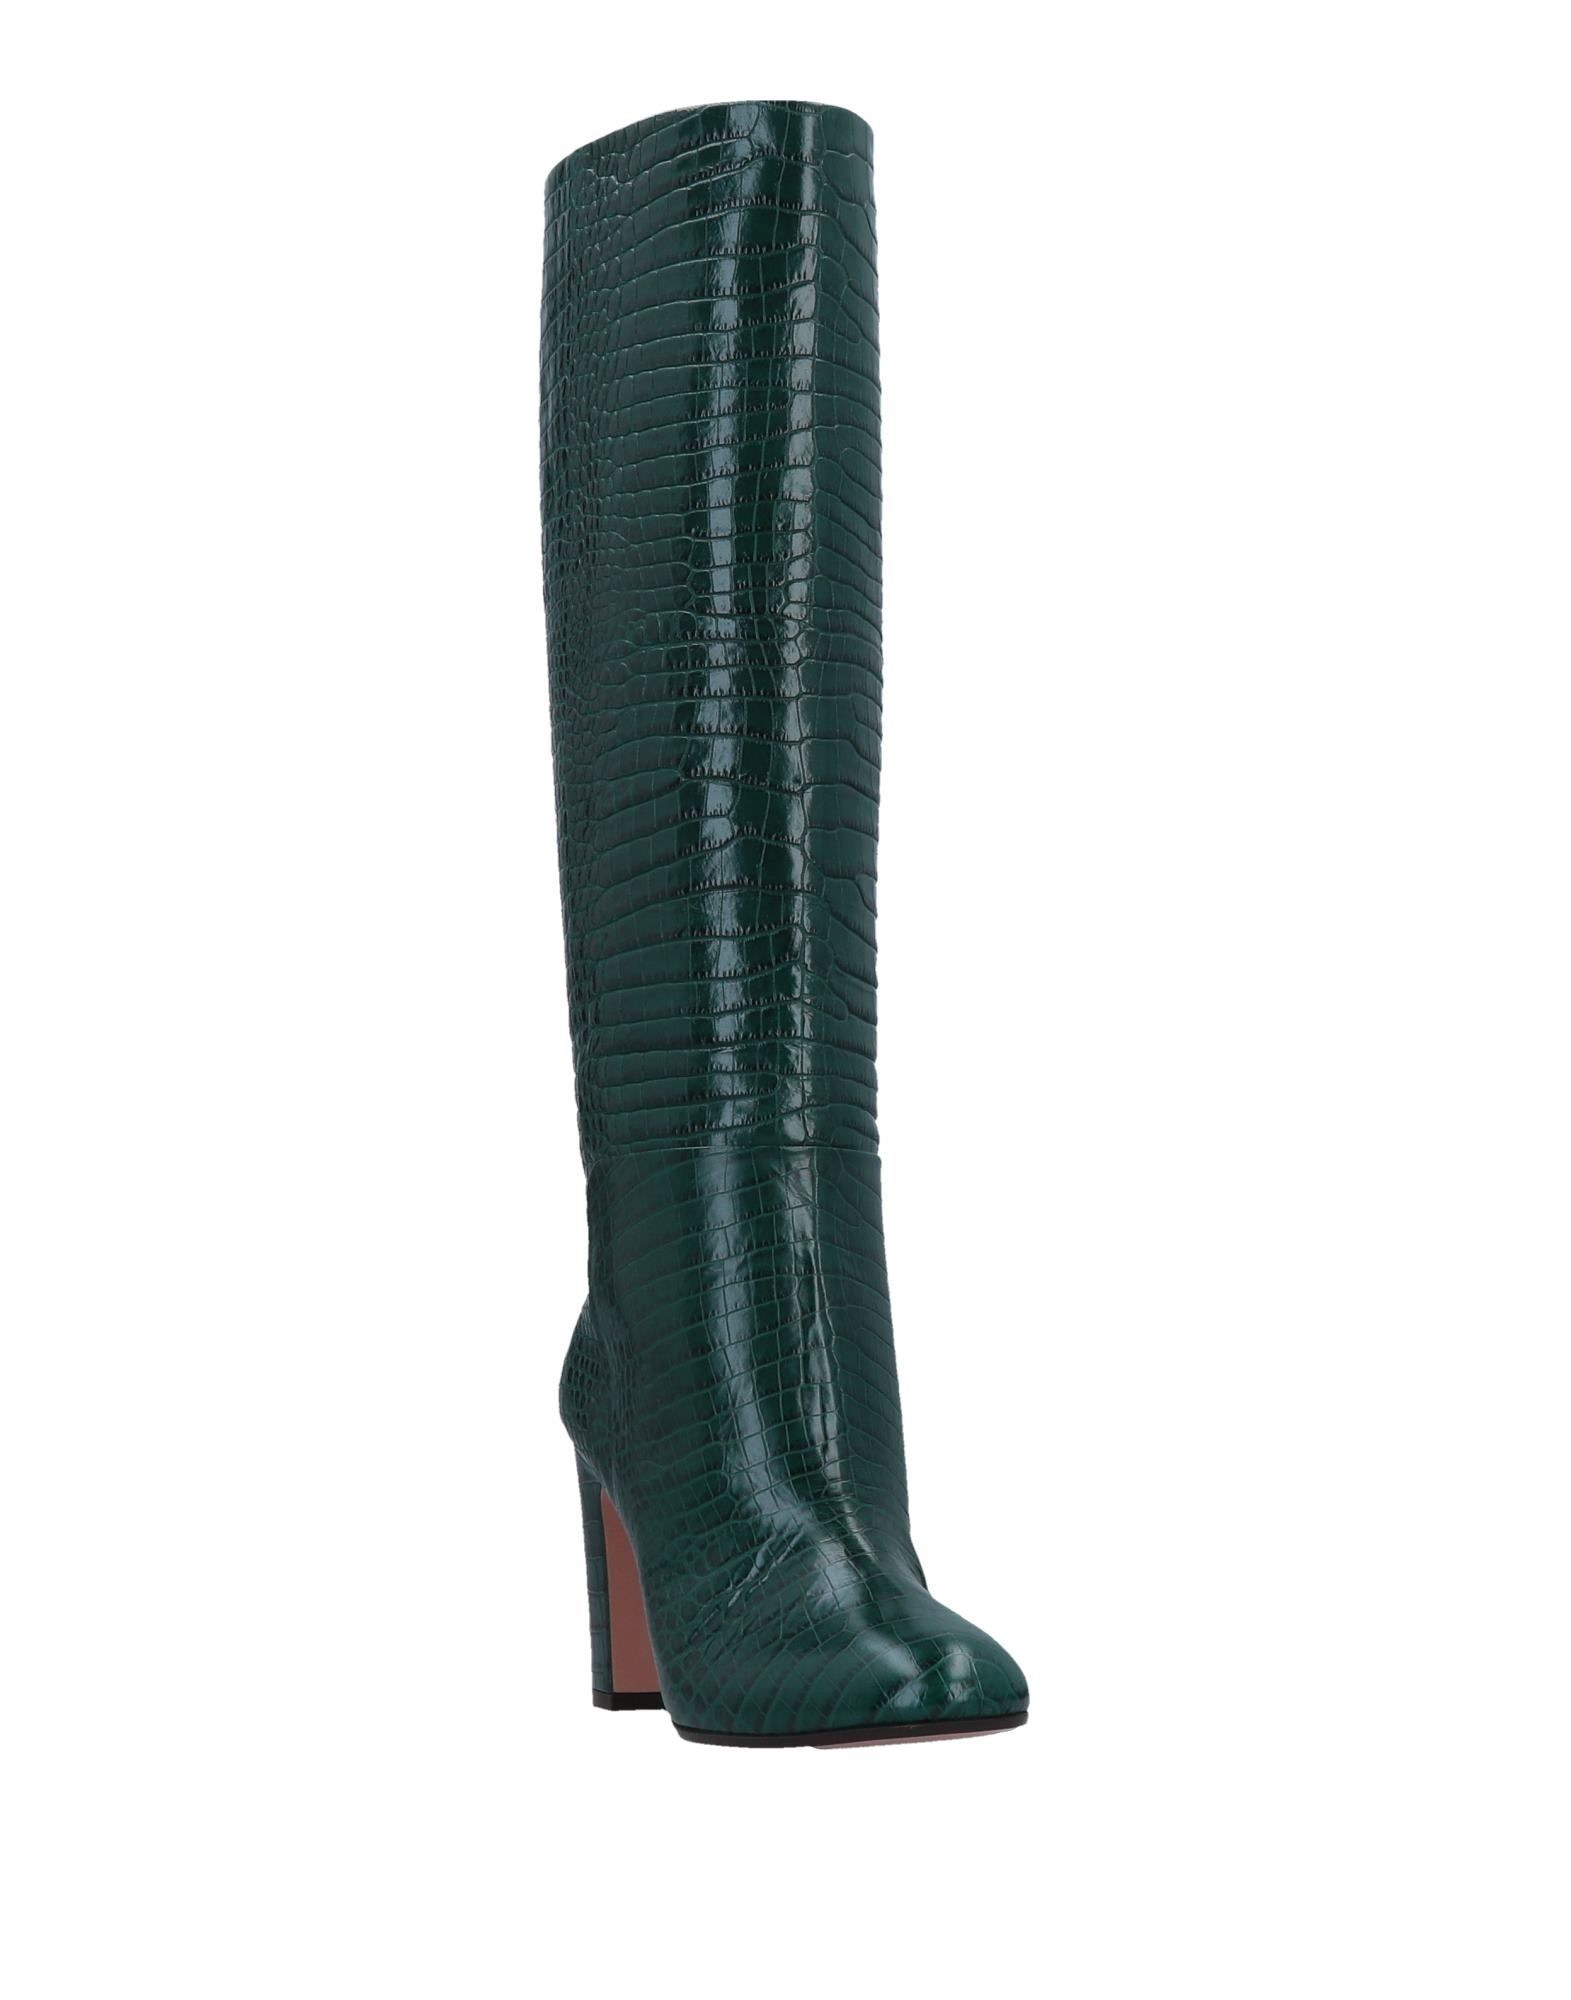 Aquazzura Stiefel Damen Schuhe  11508305ELGünstige gut aussehende Schuhe Damen 5b7298